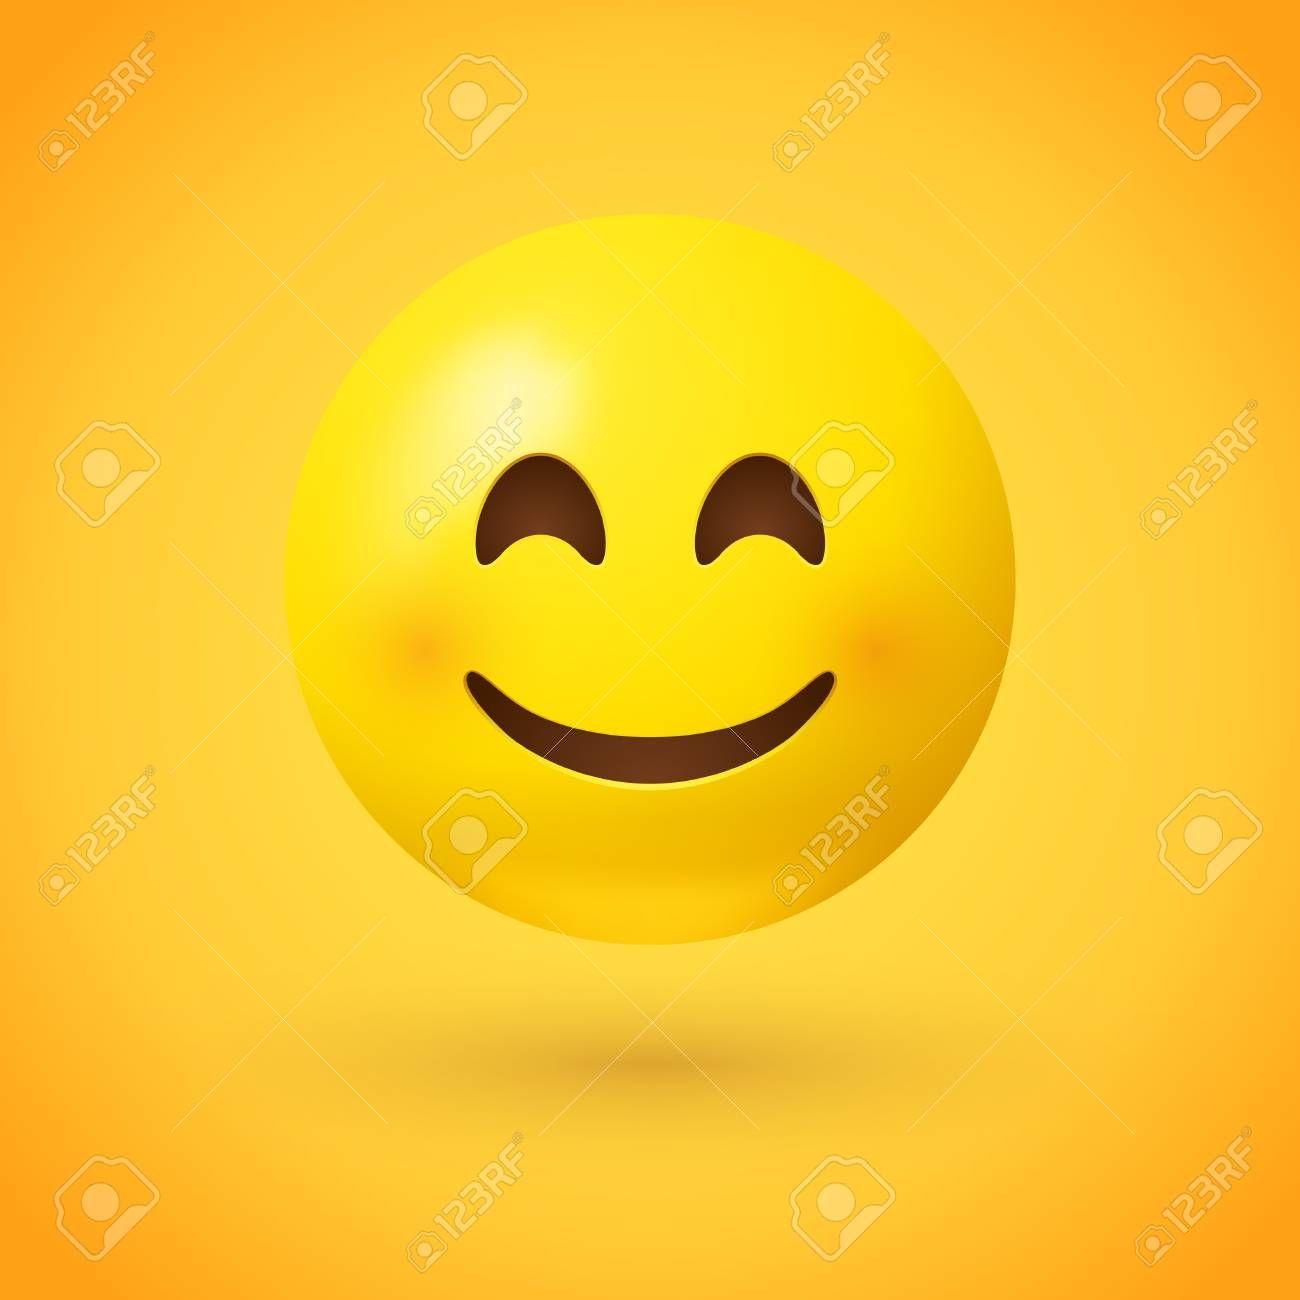 Smiley Emoji Wallpaper For Whatsapp Status Smile Face